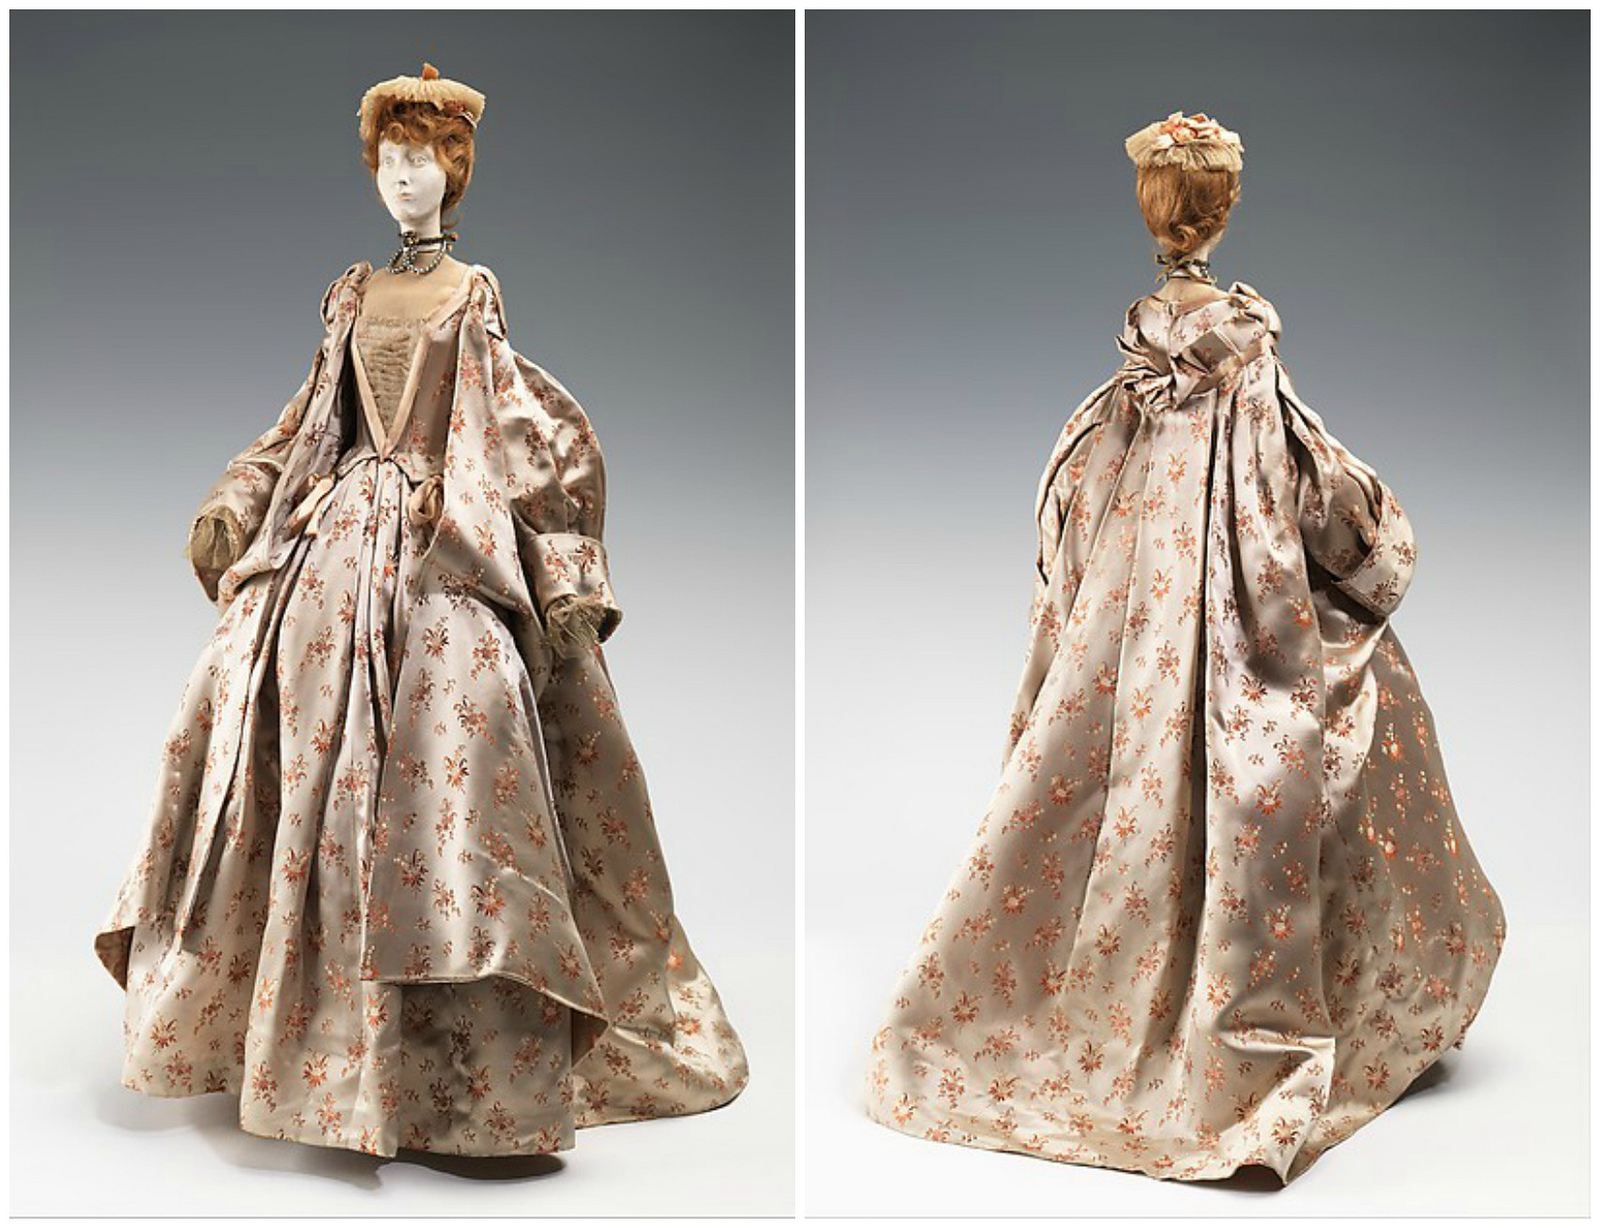 20 Handmade Dolls Tell the History of Fashion – 5-Minute History